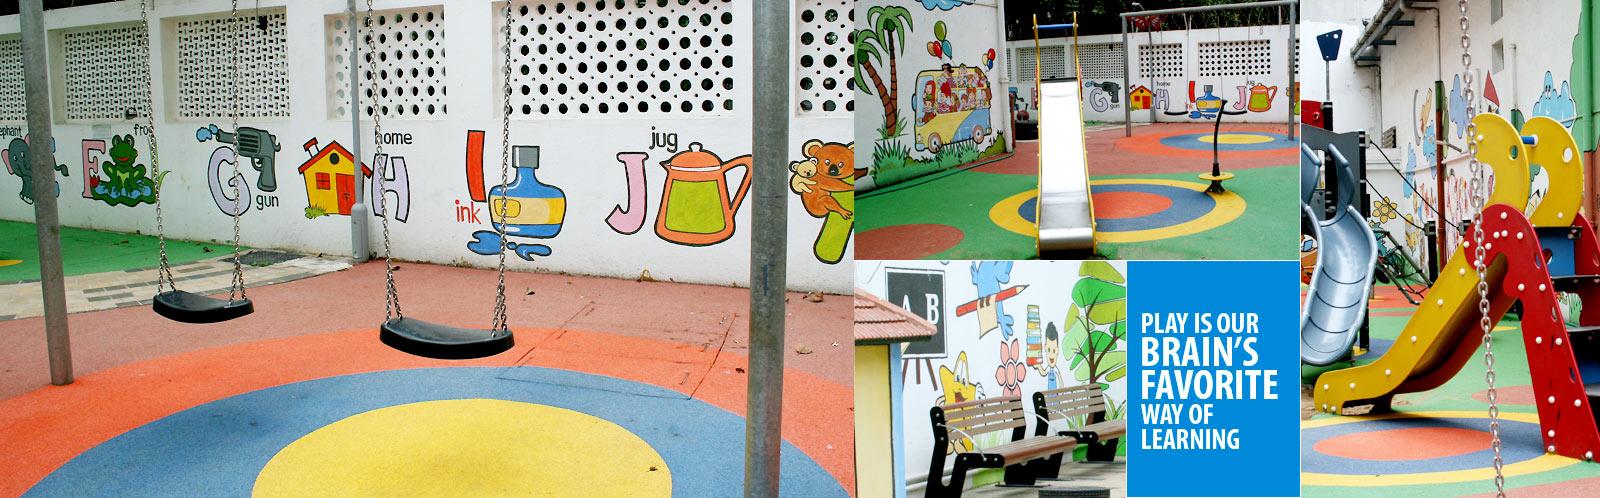 Cci Children Play Area